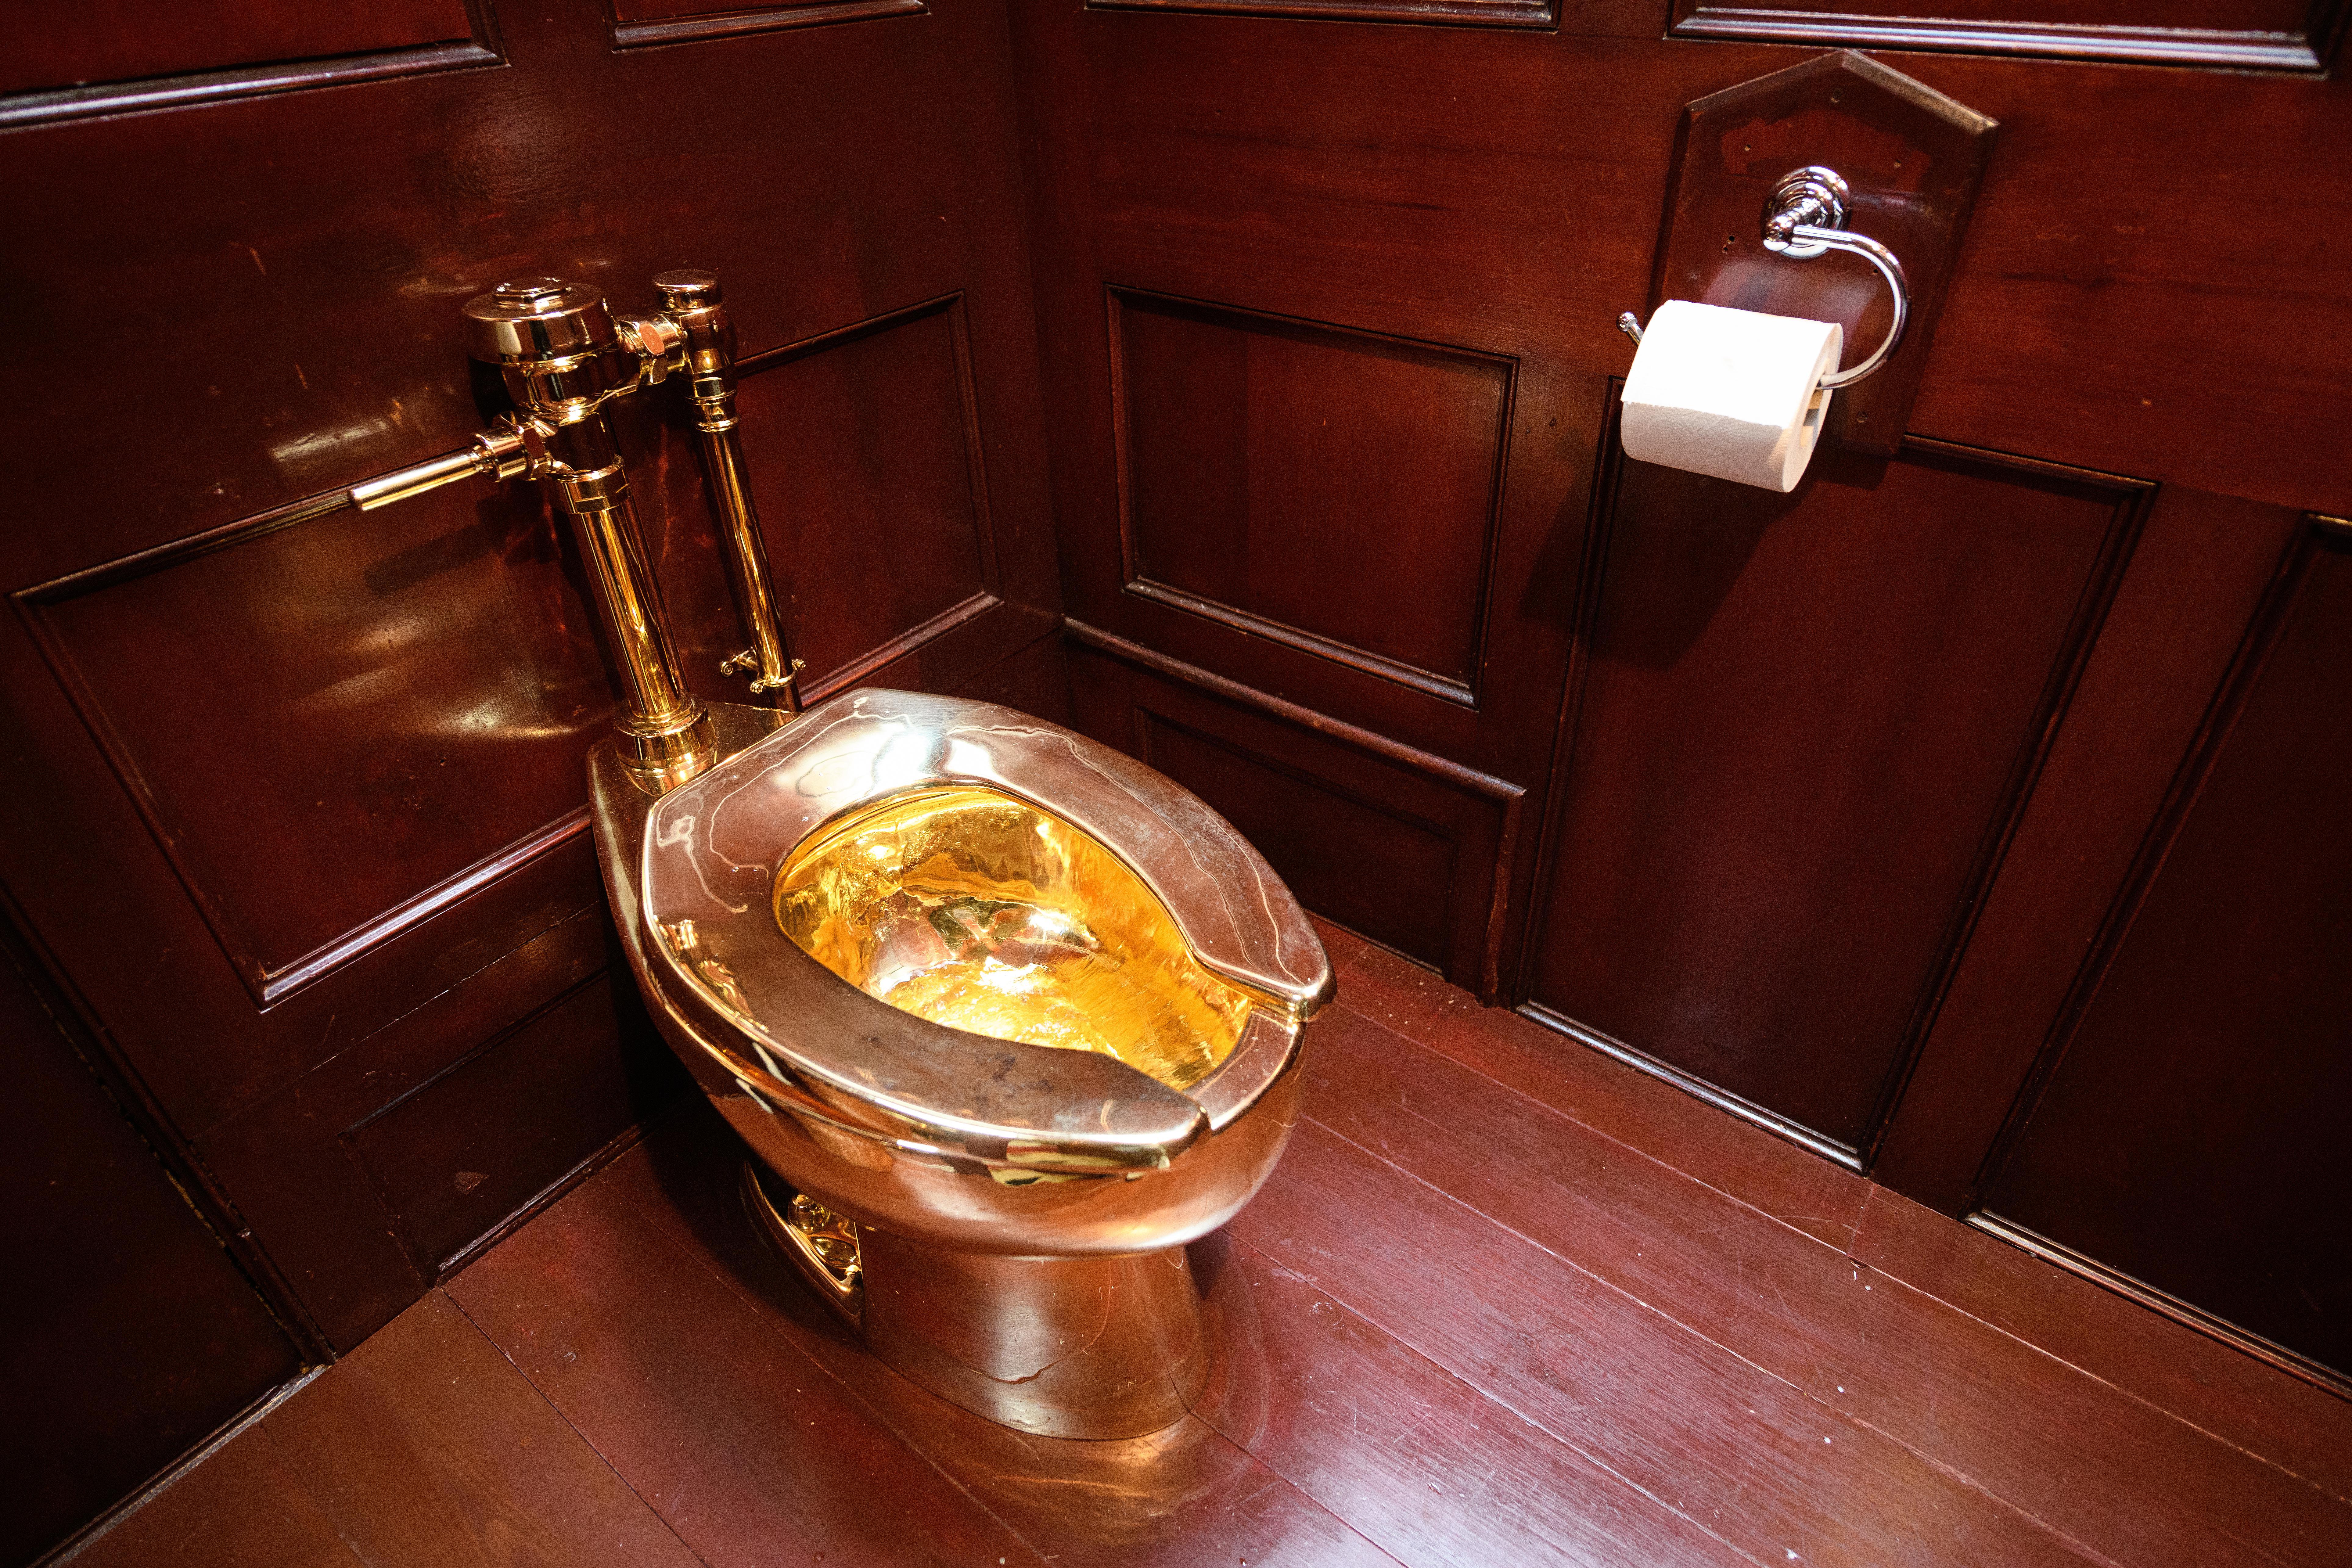 Who Actually Buys a Gold Toilet?